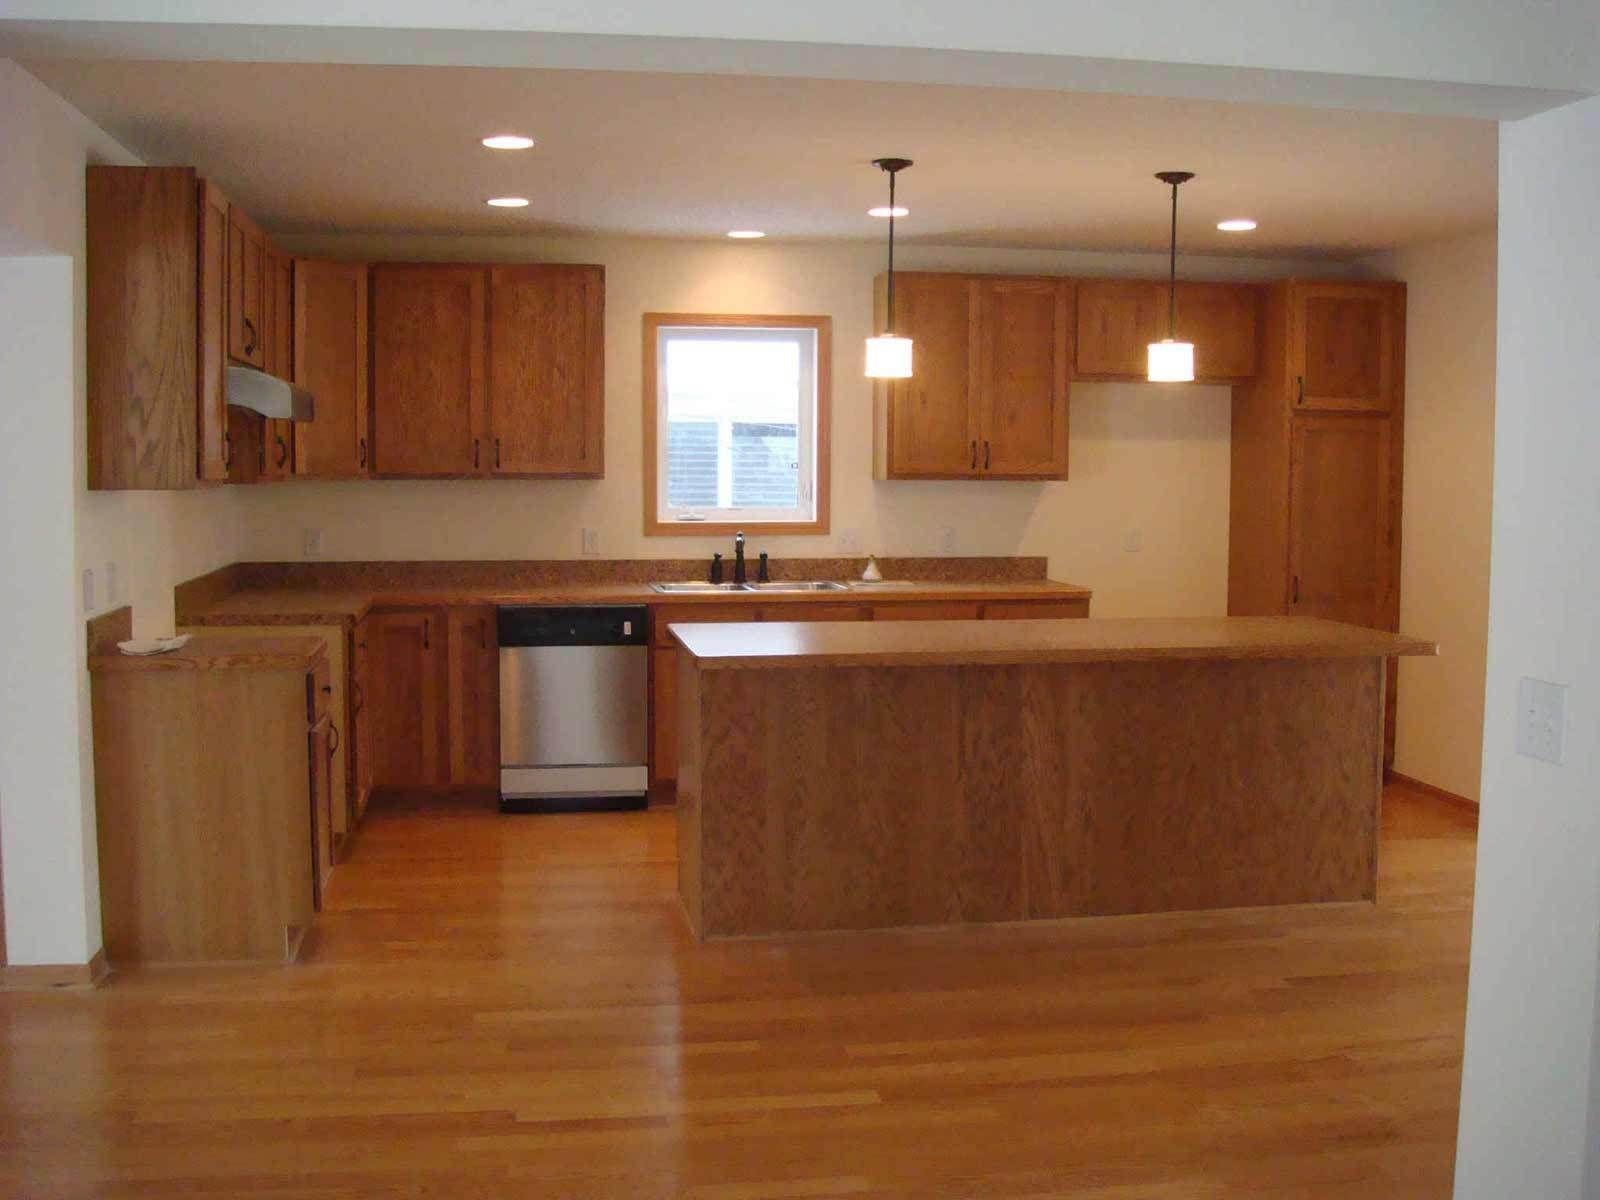 flooring kitchen ideas feel home kitchen small spaces ideas vinyl ...